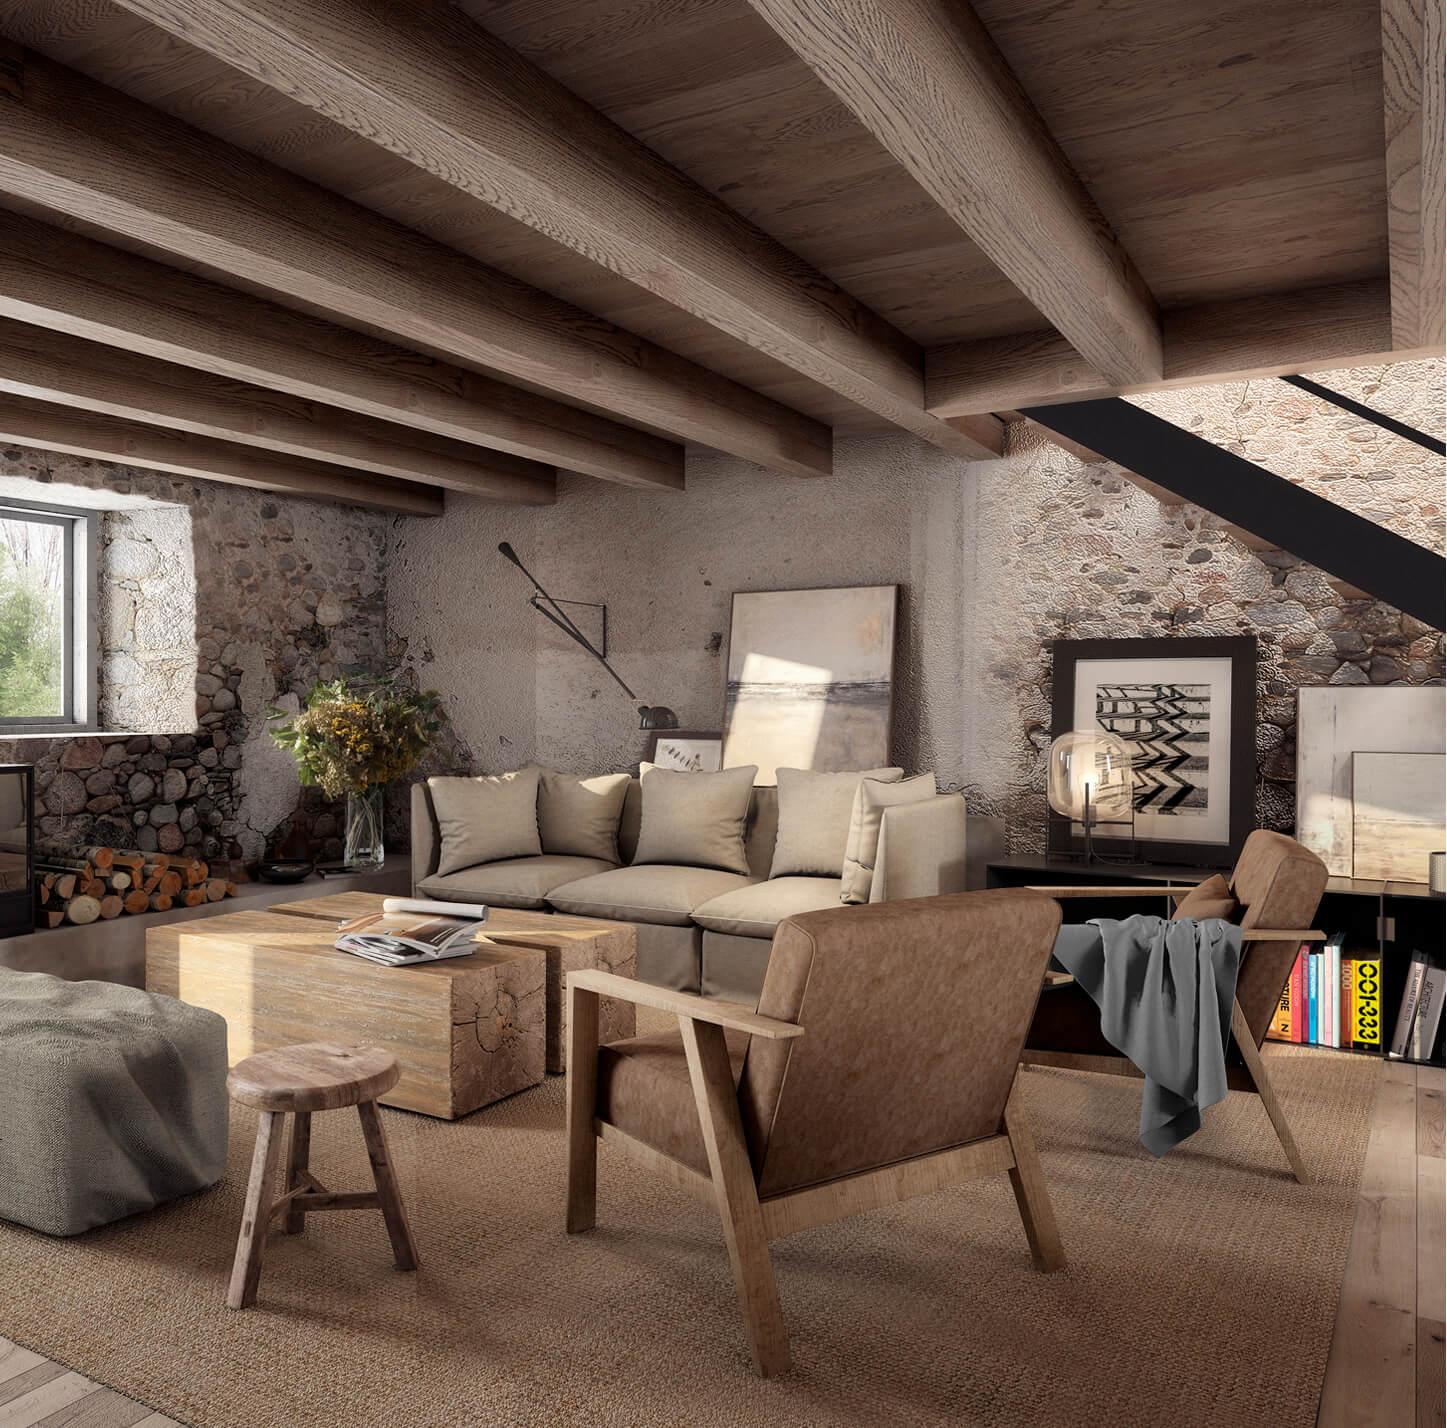 10-Viviendas en Bourg-Madame-CO arquitectura